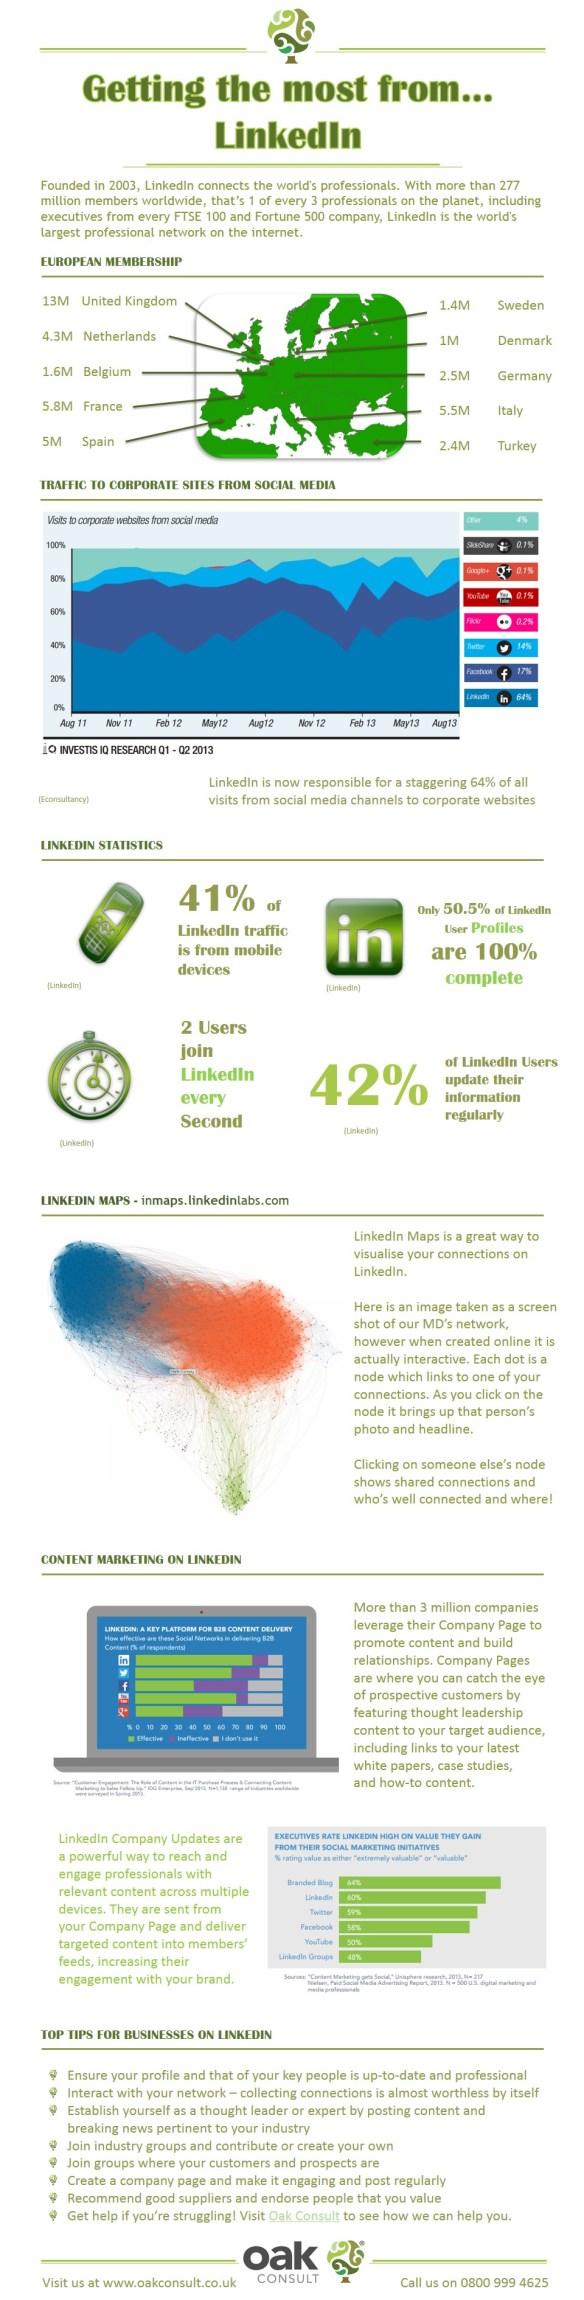 LinkedIn, Social Media, Infographic